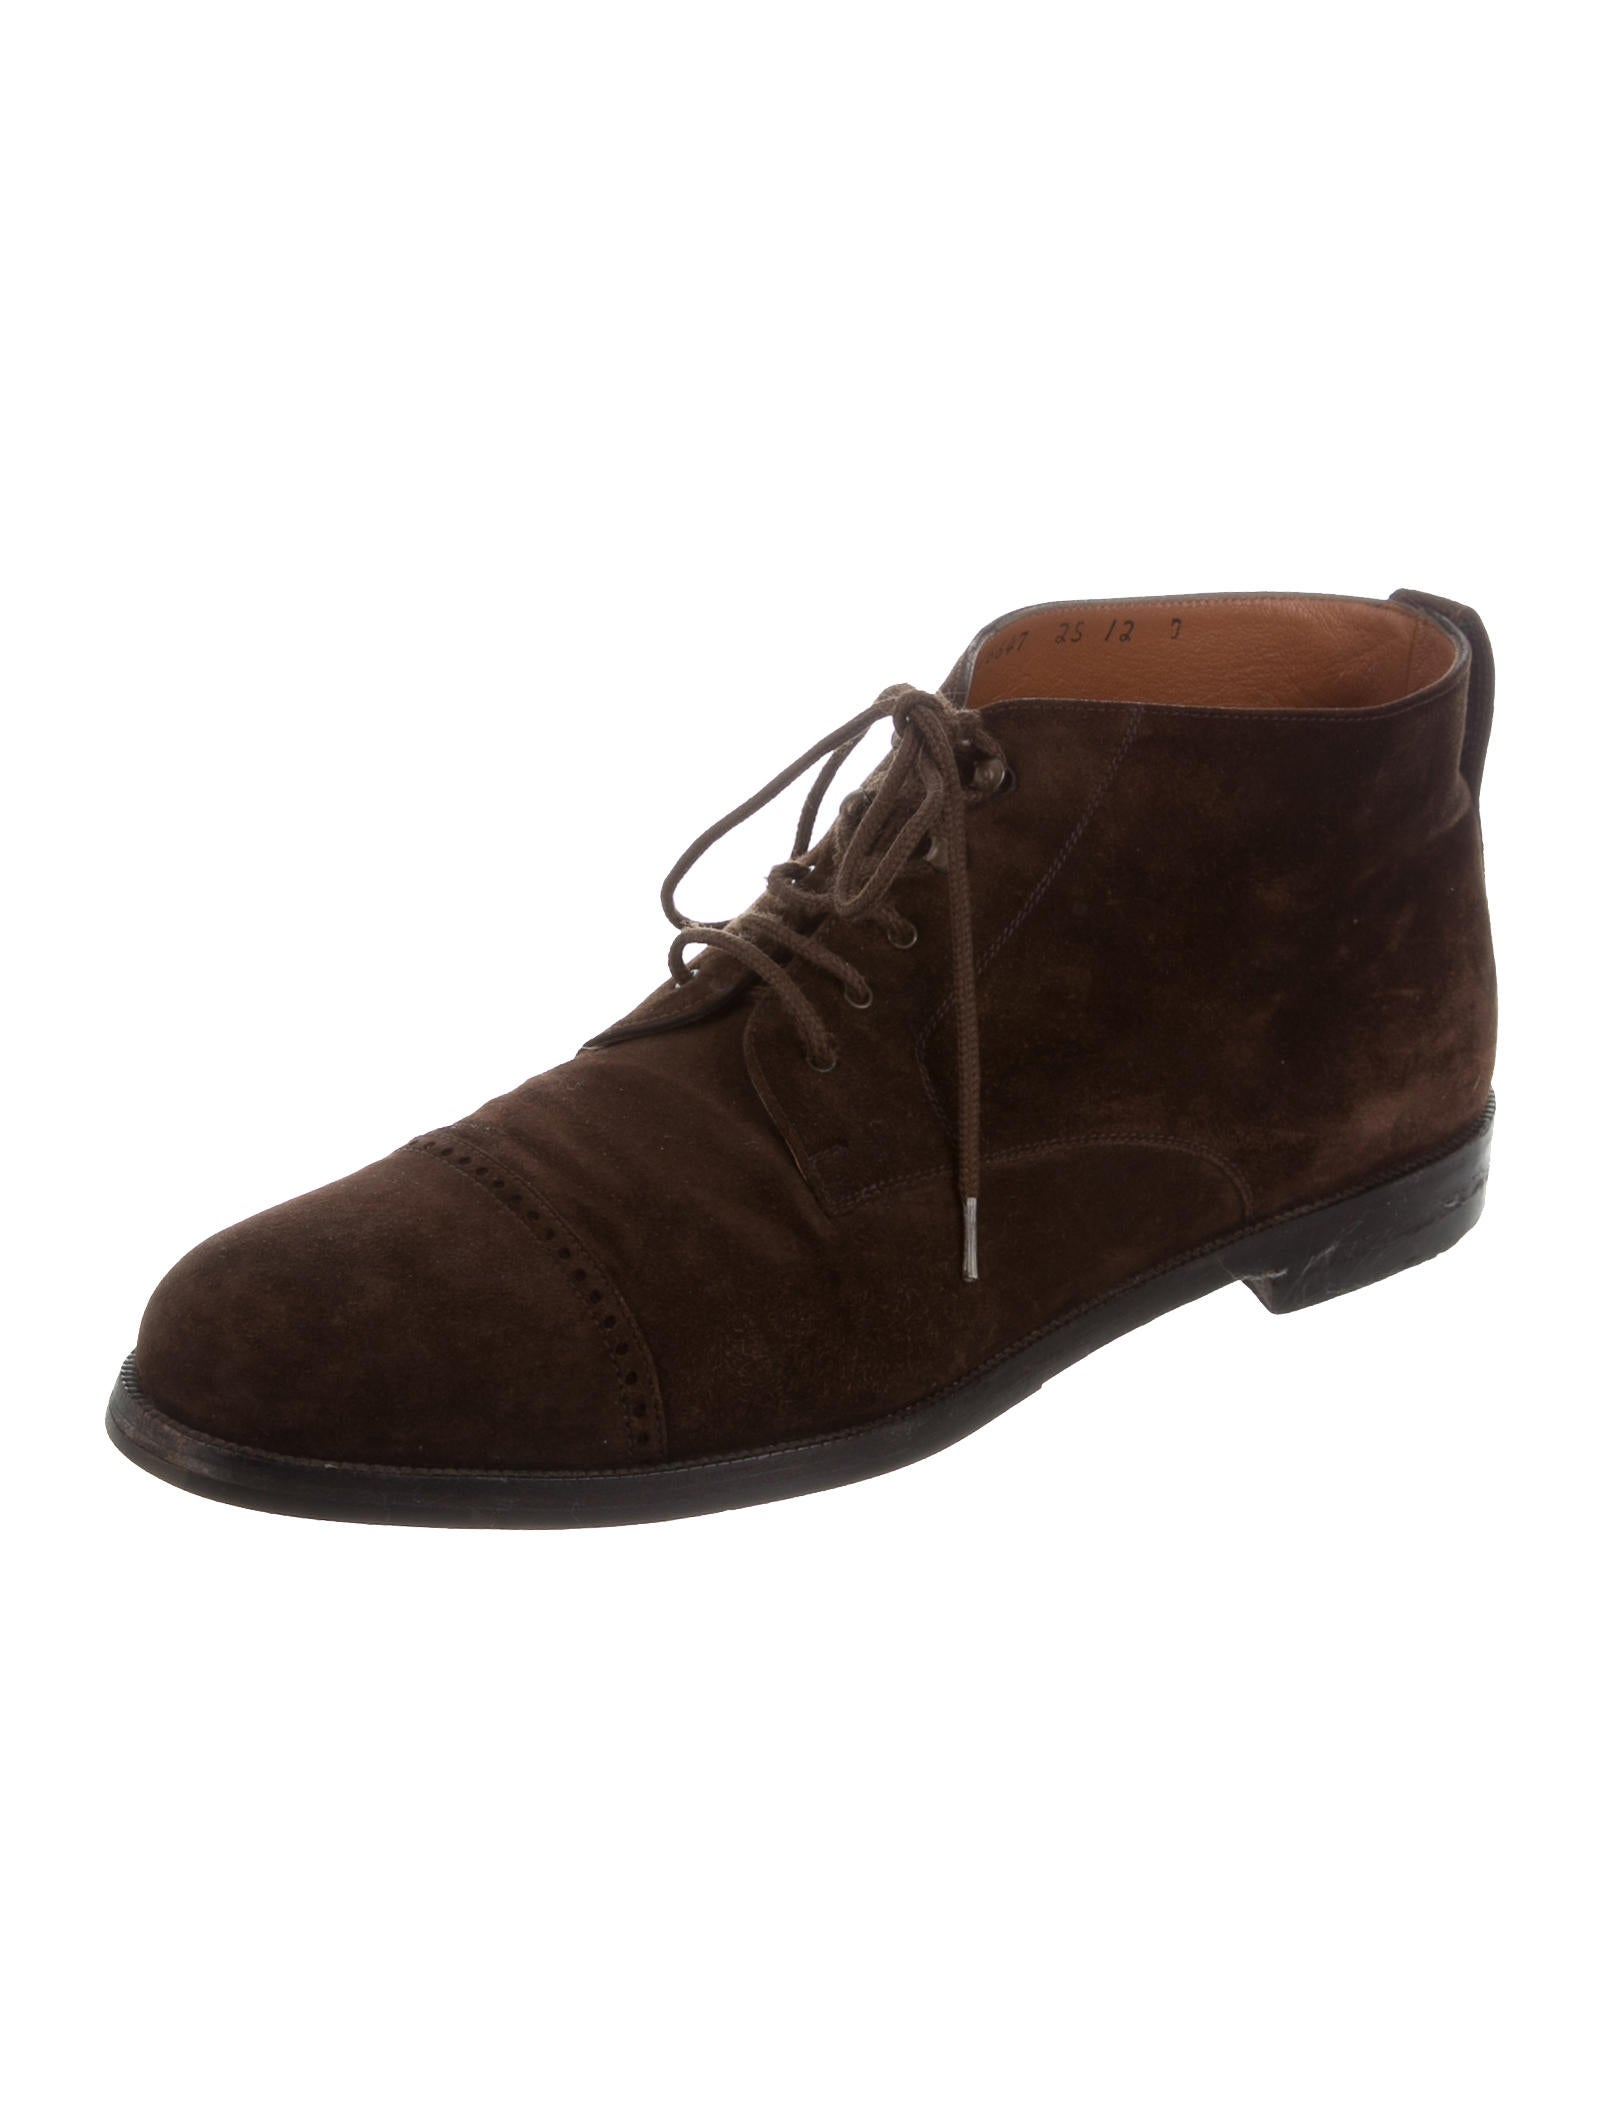 salvatore ferragamo suede ankle boots shoes sal46364